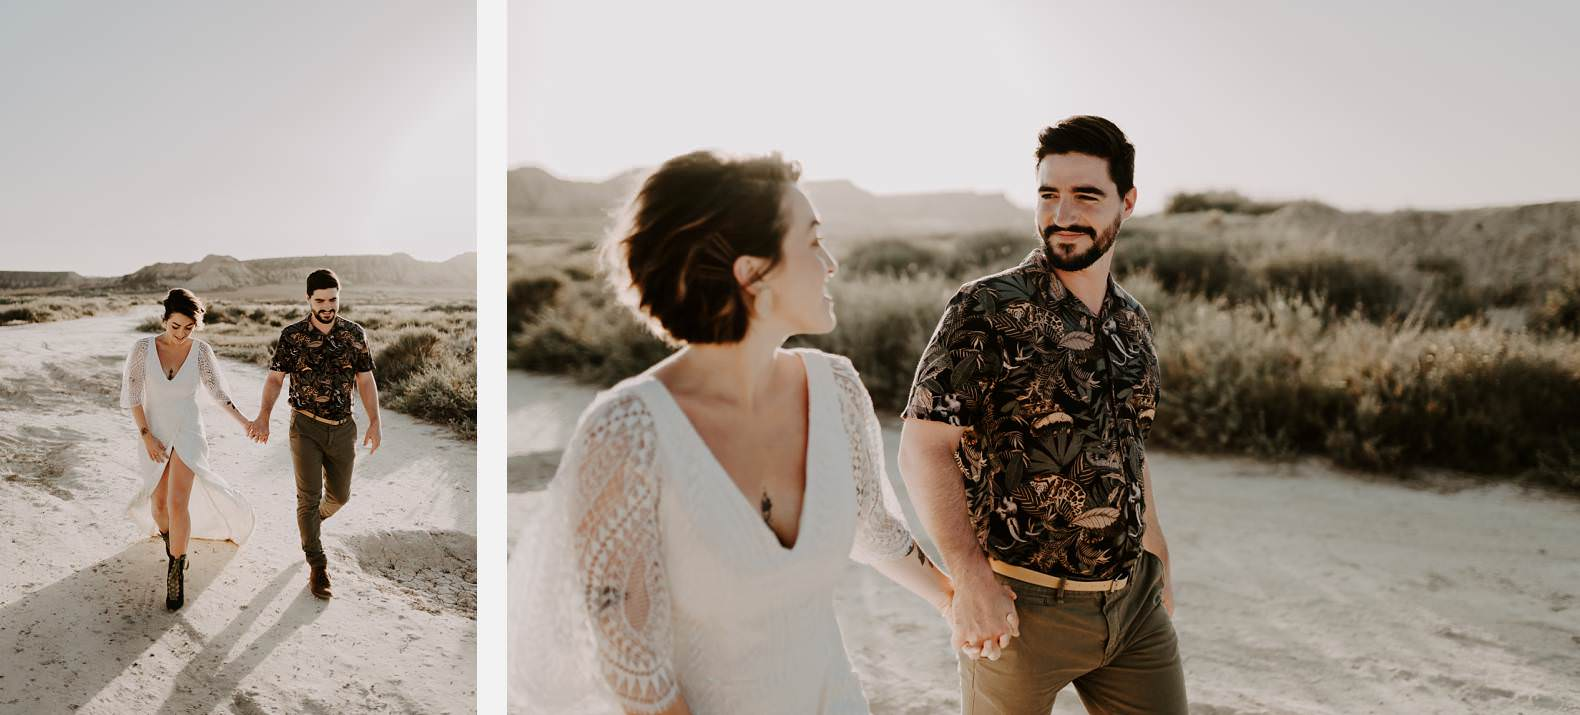 mariage espagne bardenas festival you and me elopement photographe bel esprit desert 0031